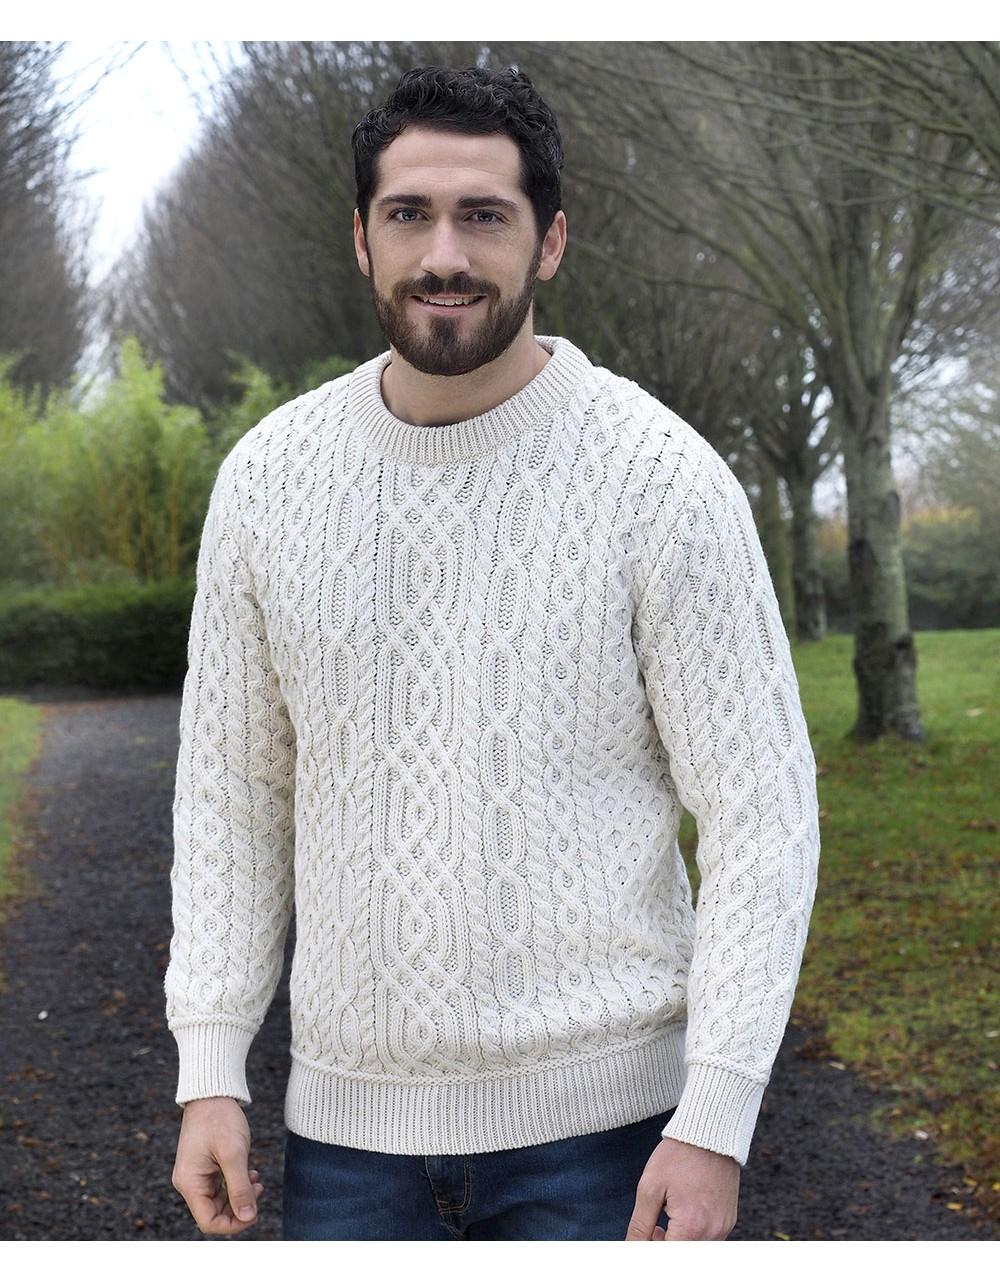 Aran Style Crew Neck Sweater|Aran Sweaters Men|Irish Handcrafts -1